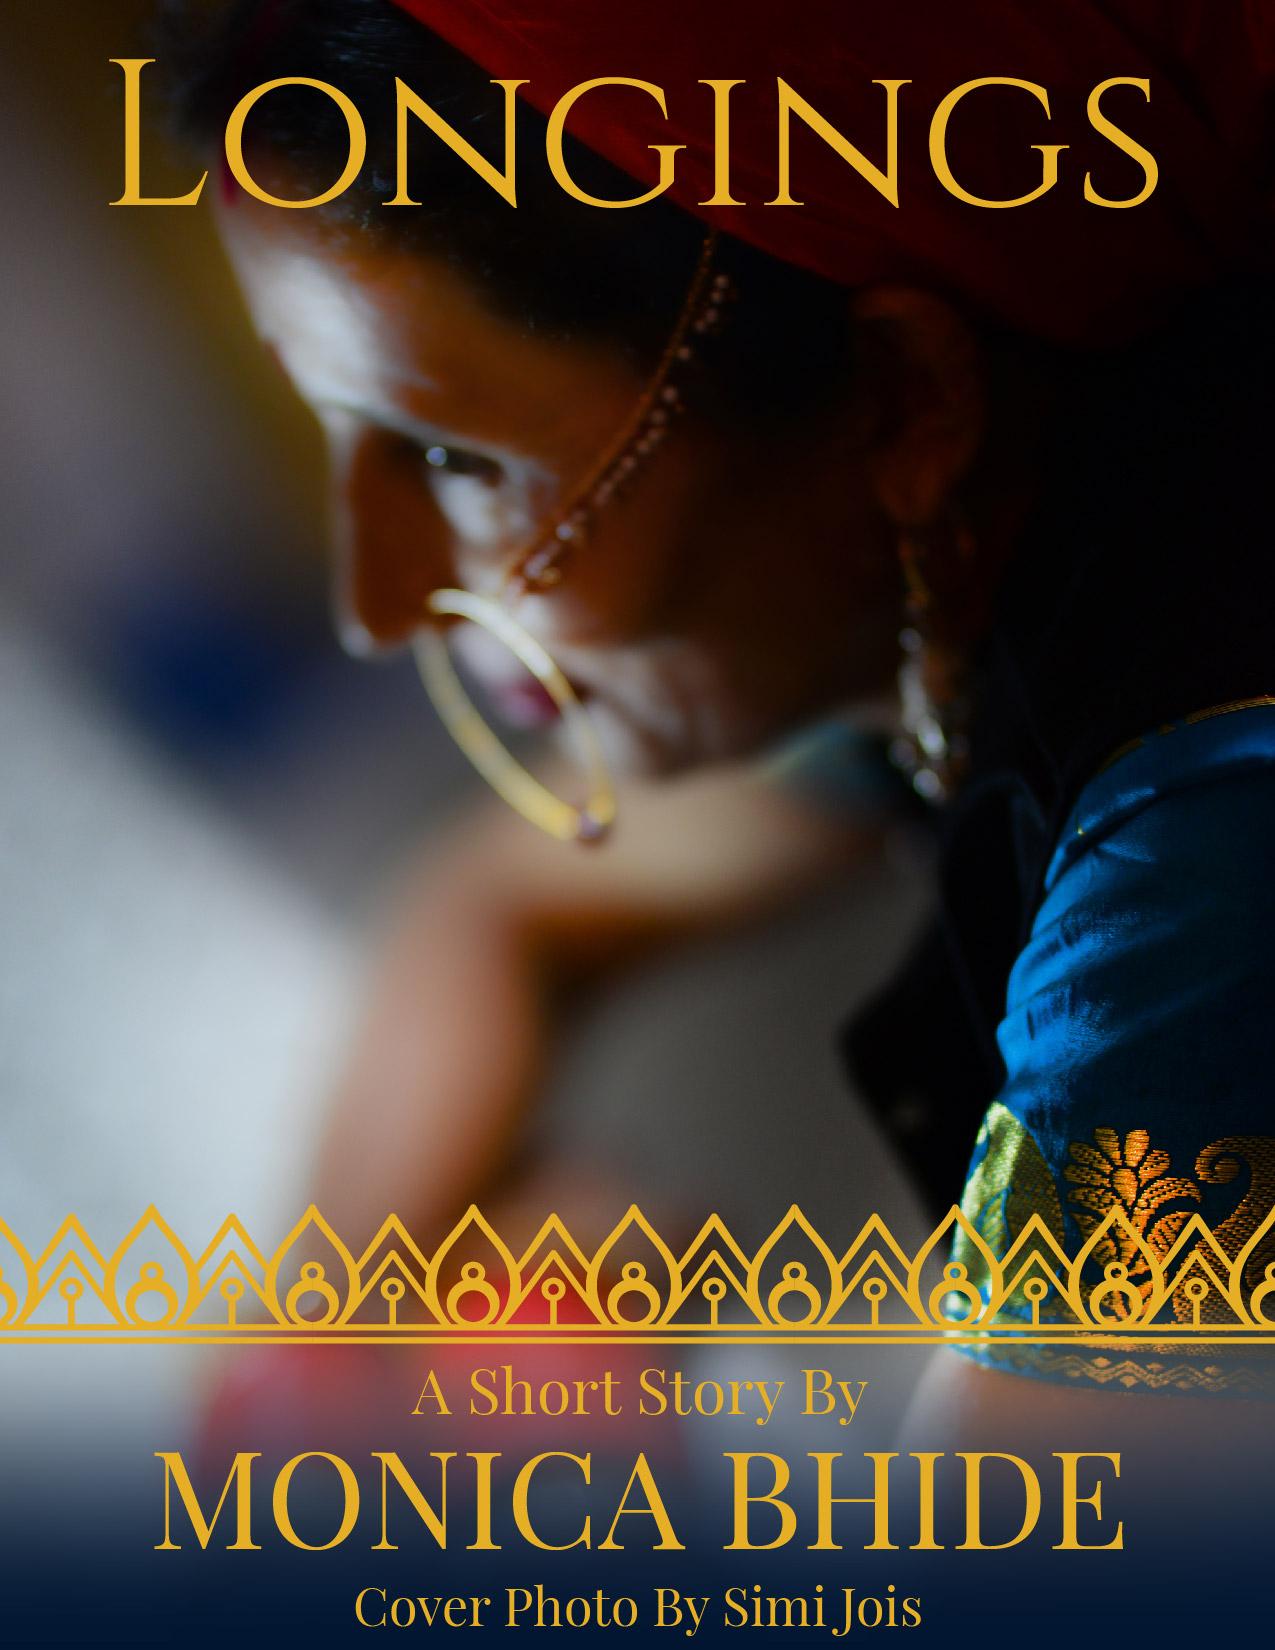 Longings by Monica Bhide